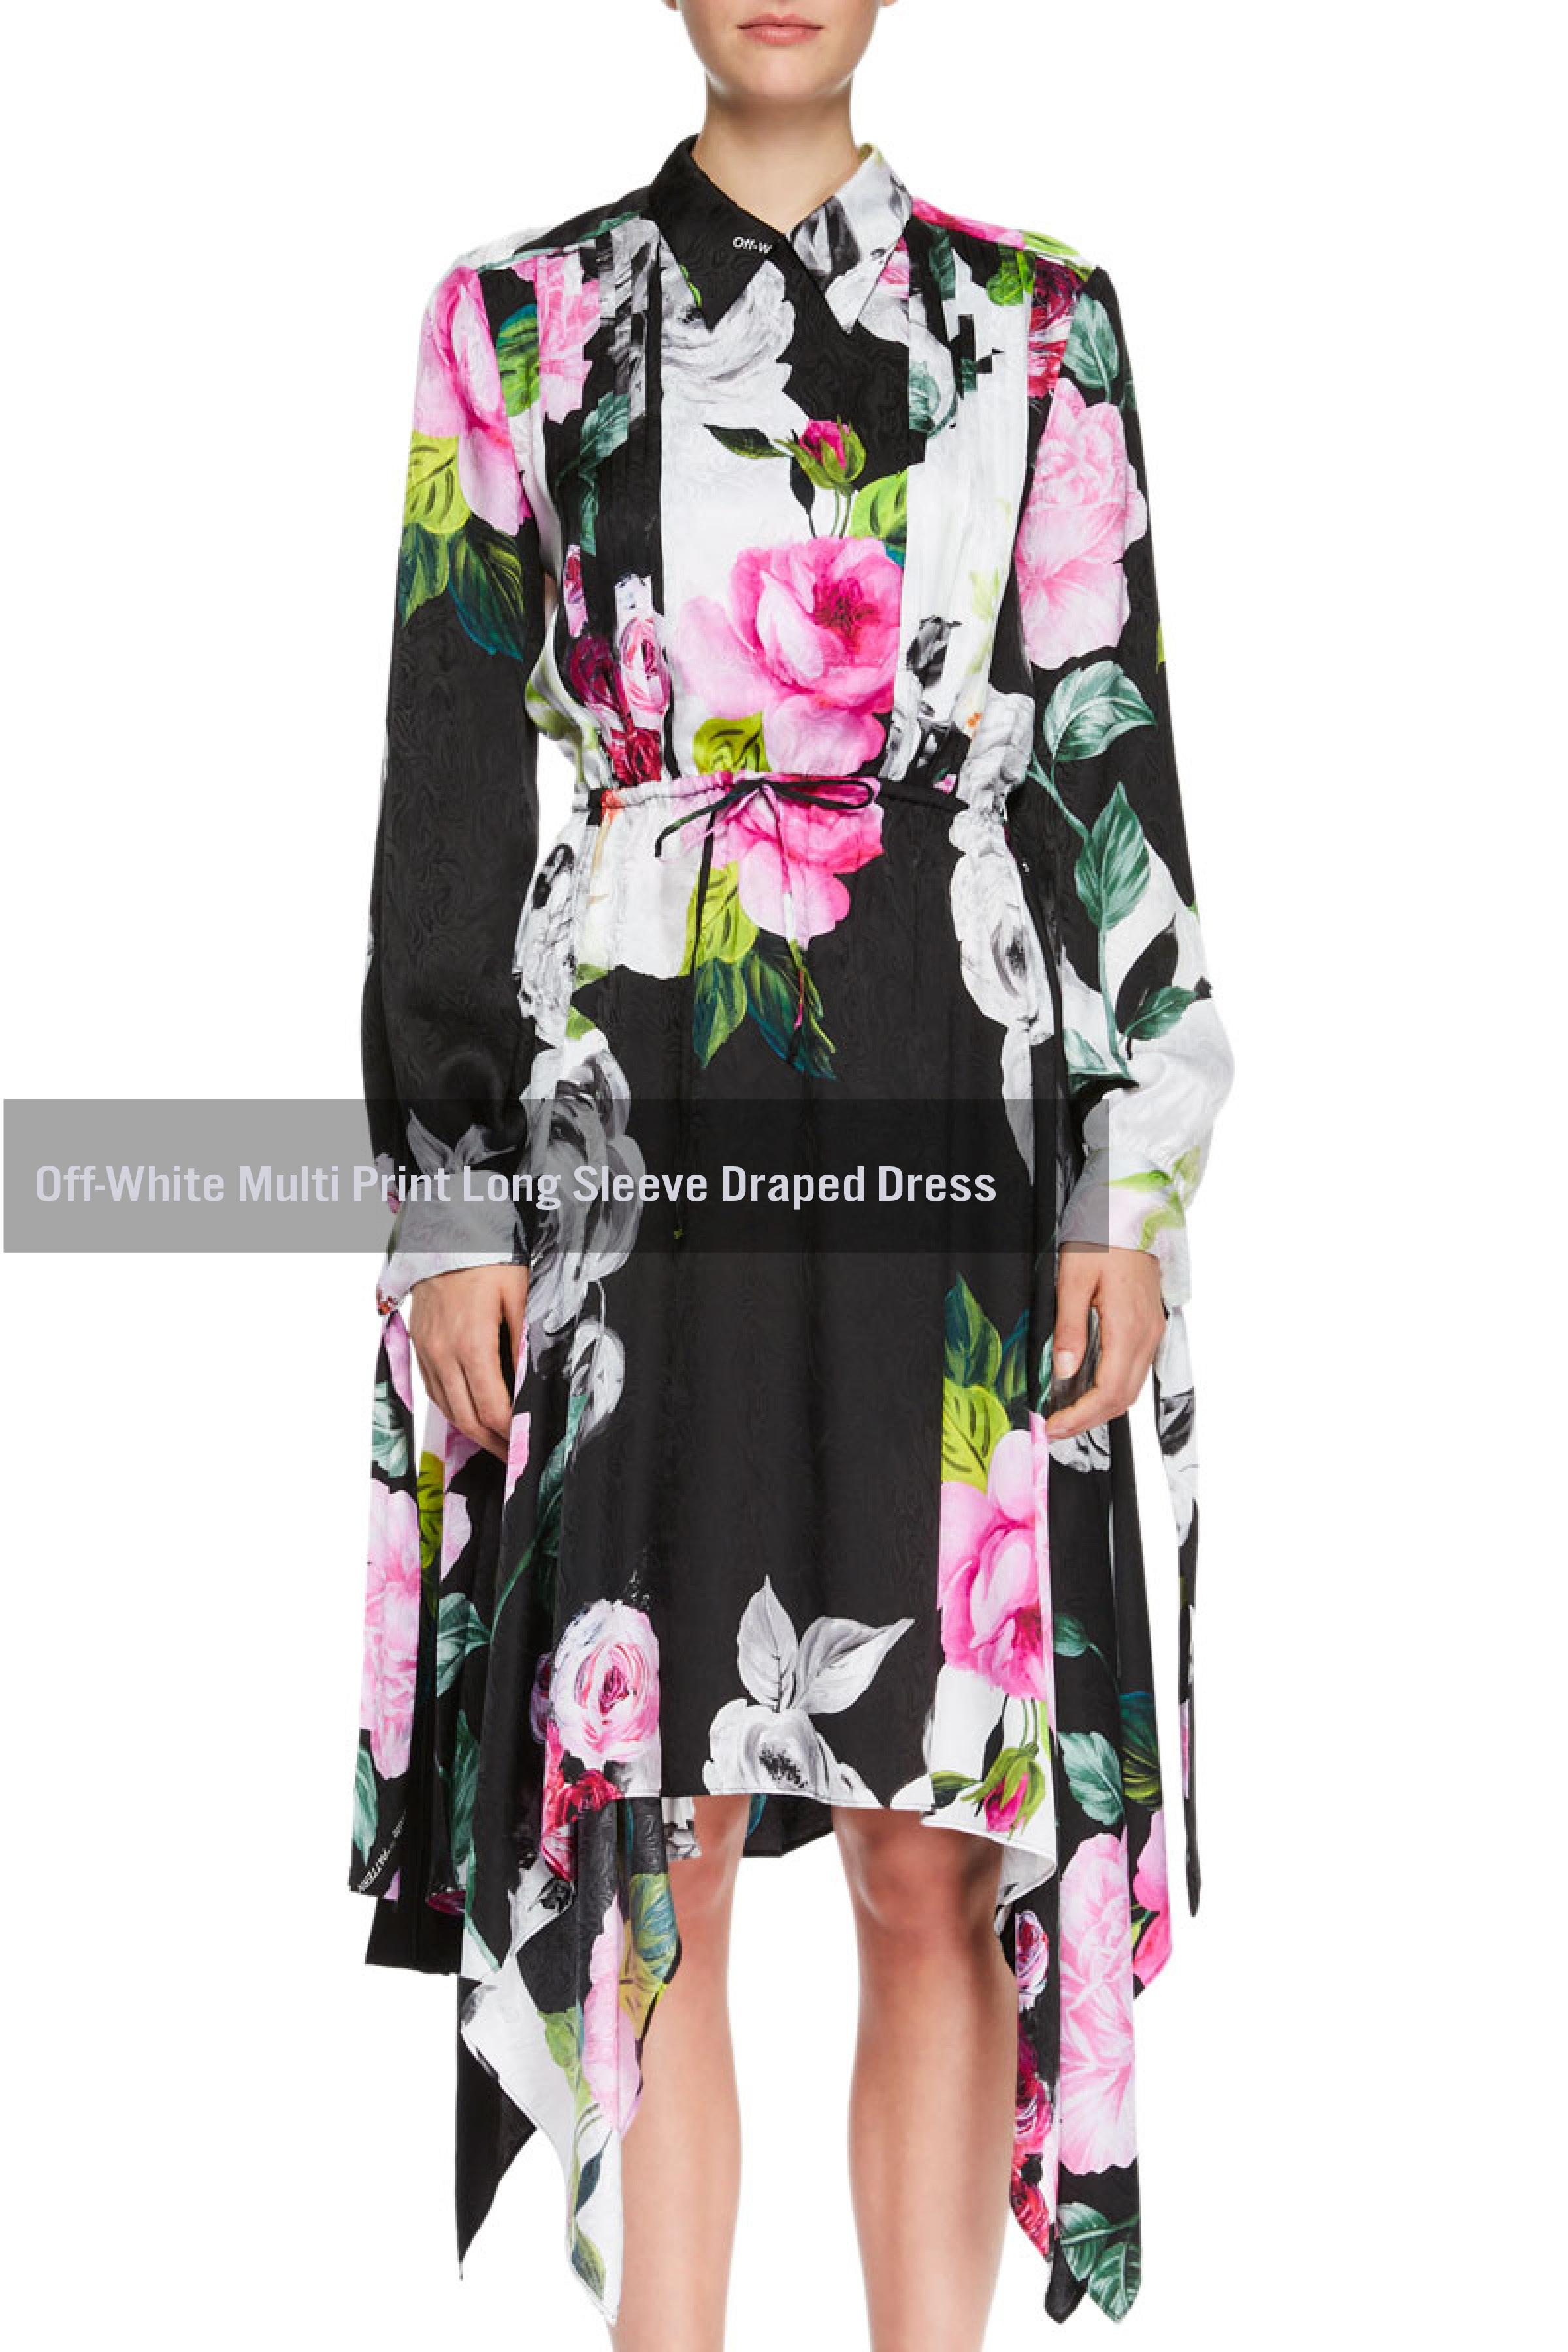 Off-White Multi Print Long Sleeve Draped Dress